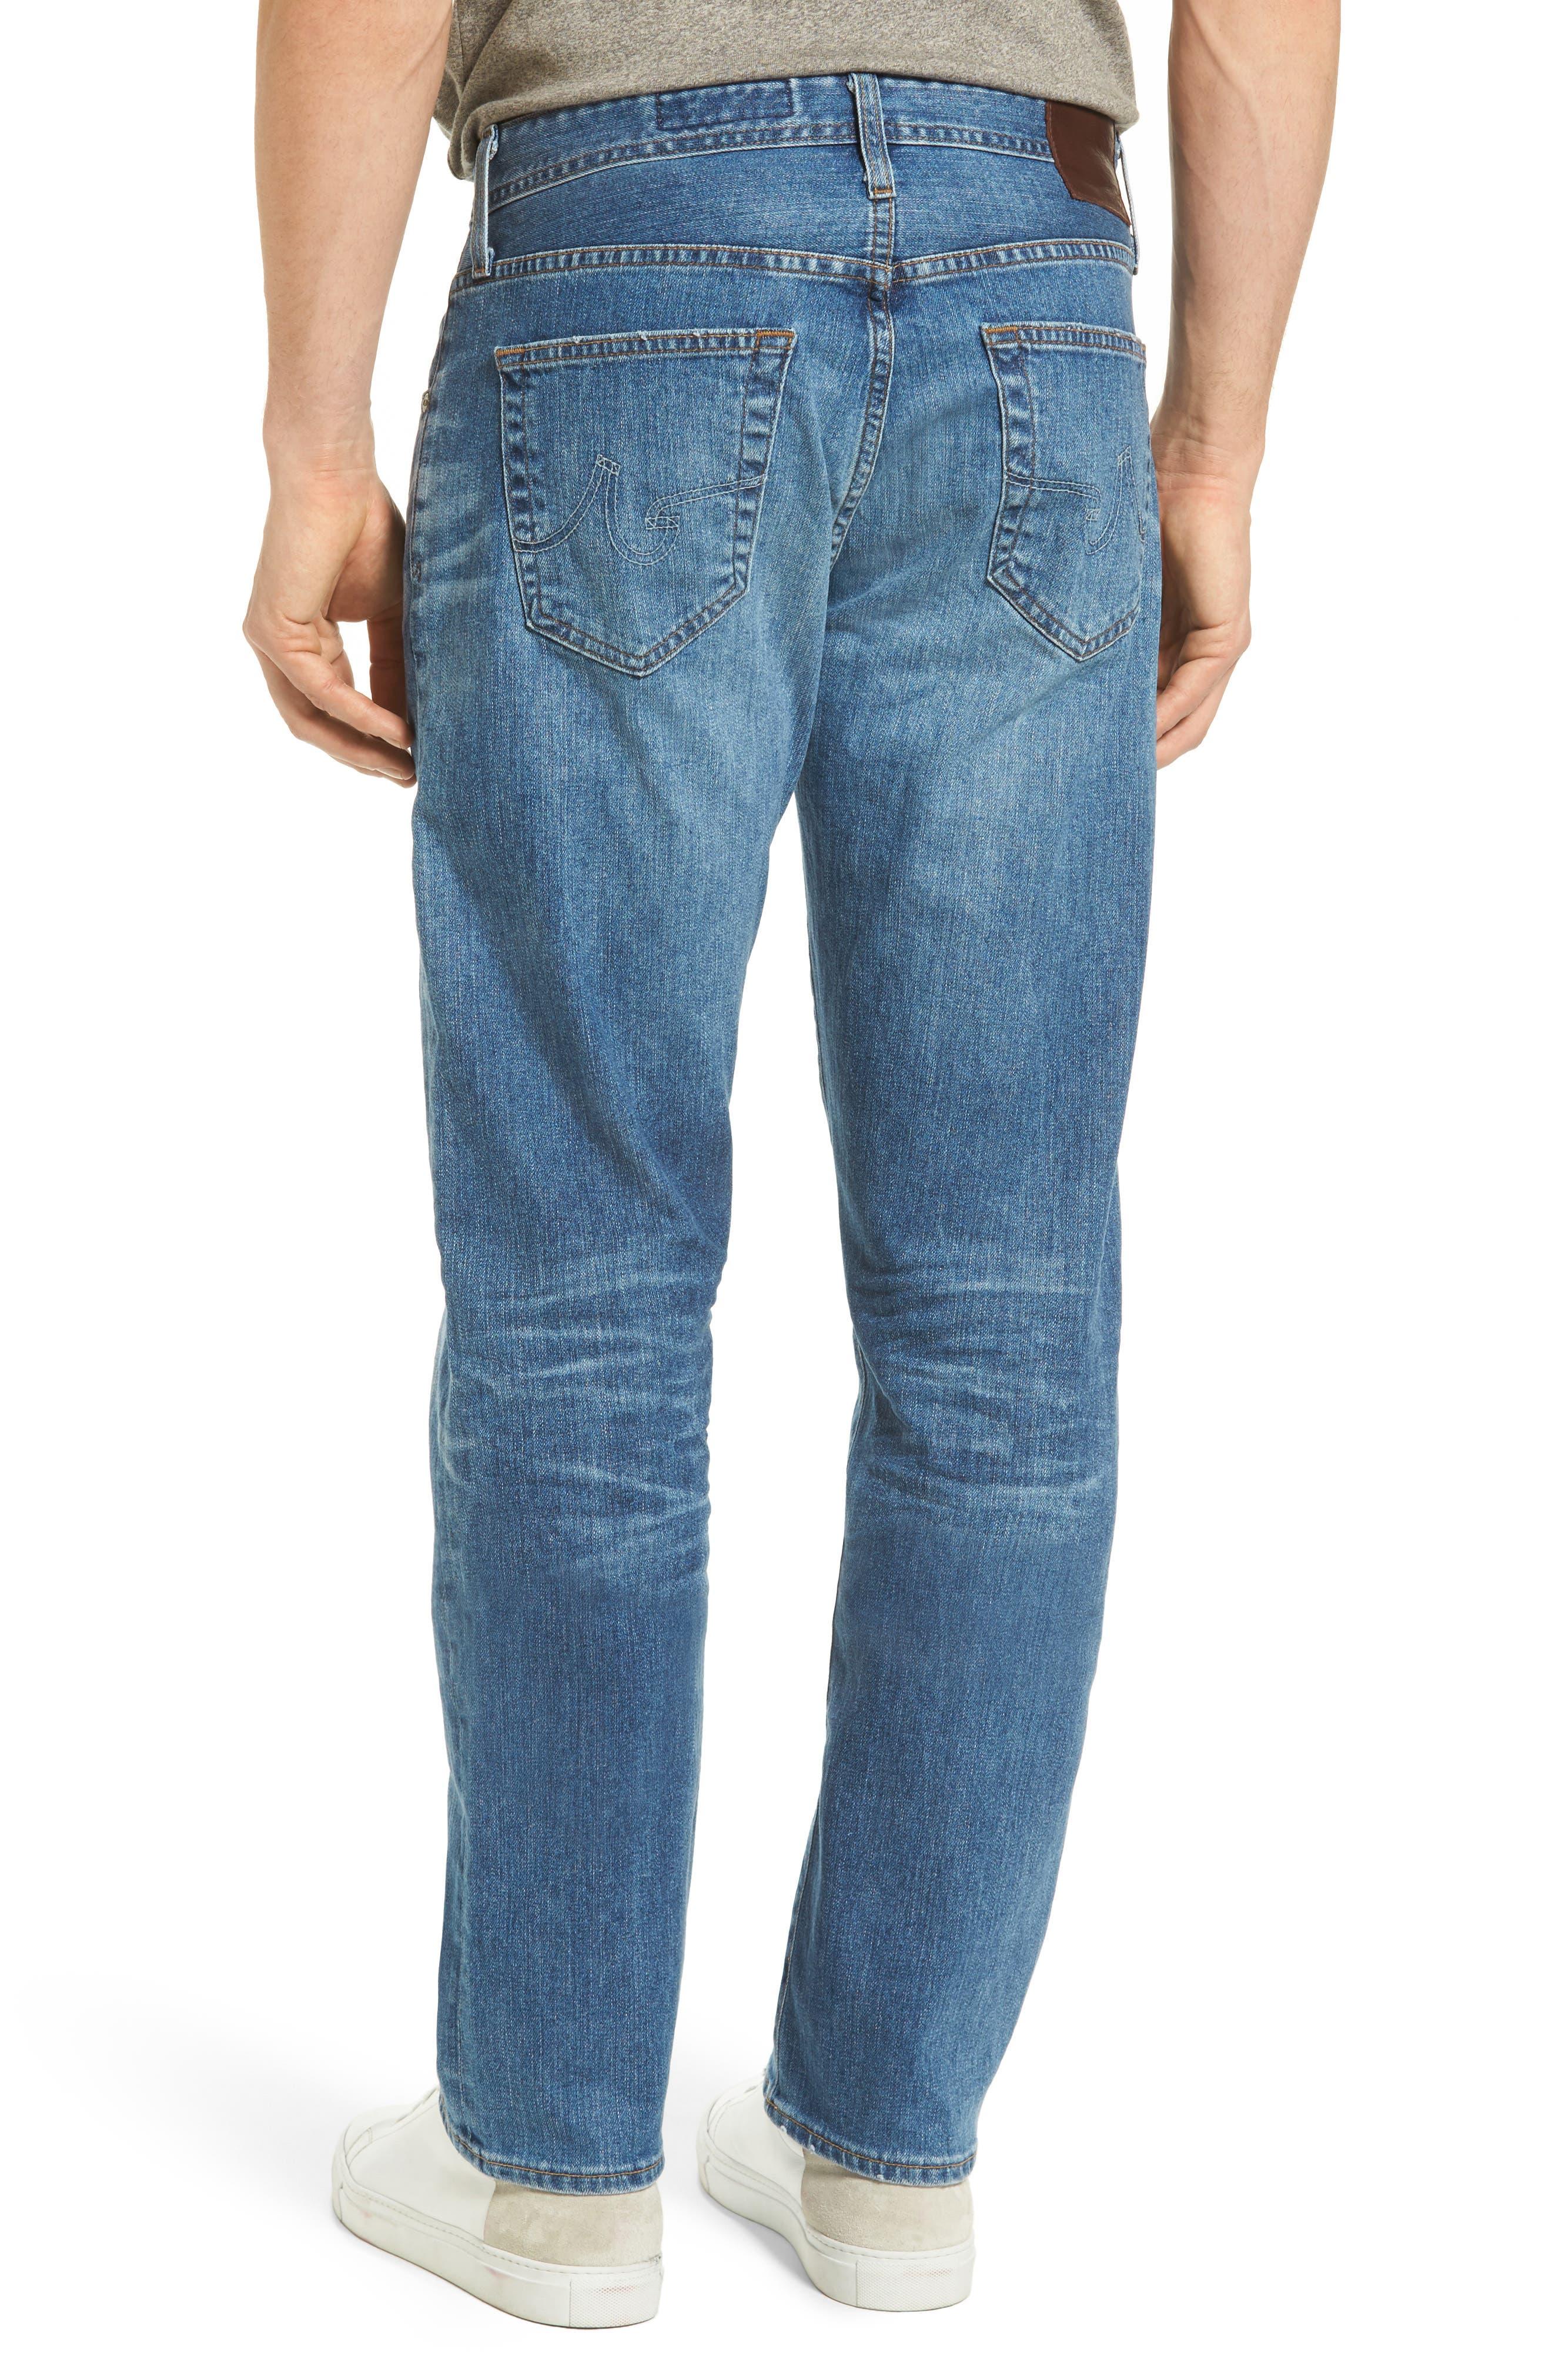 Ives Straight Leg Jeans,                             Alternate thumbnail 2, color,                             16 Years Broken Ground